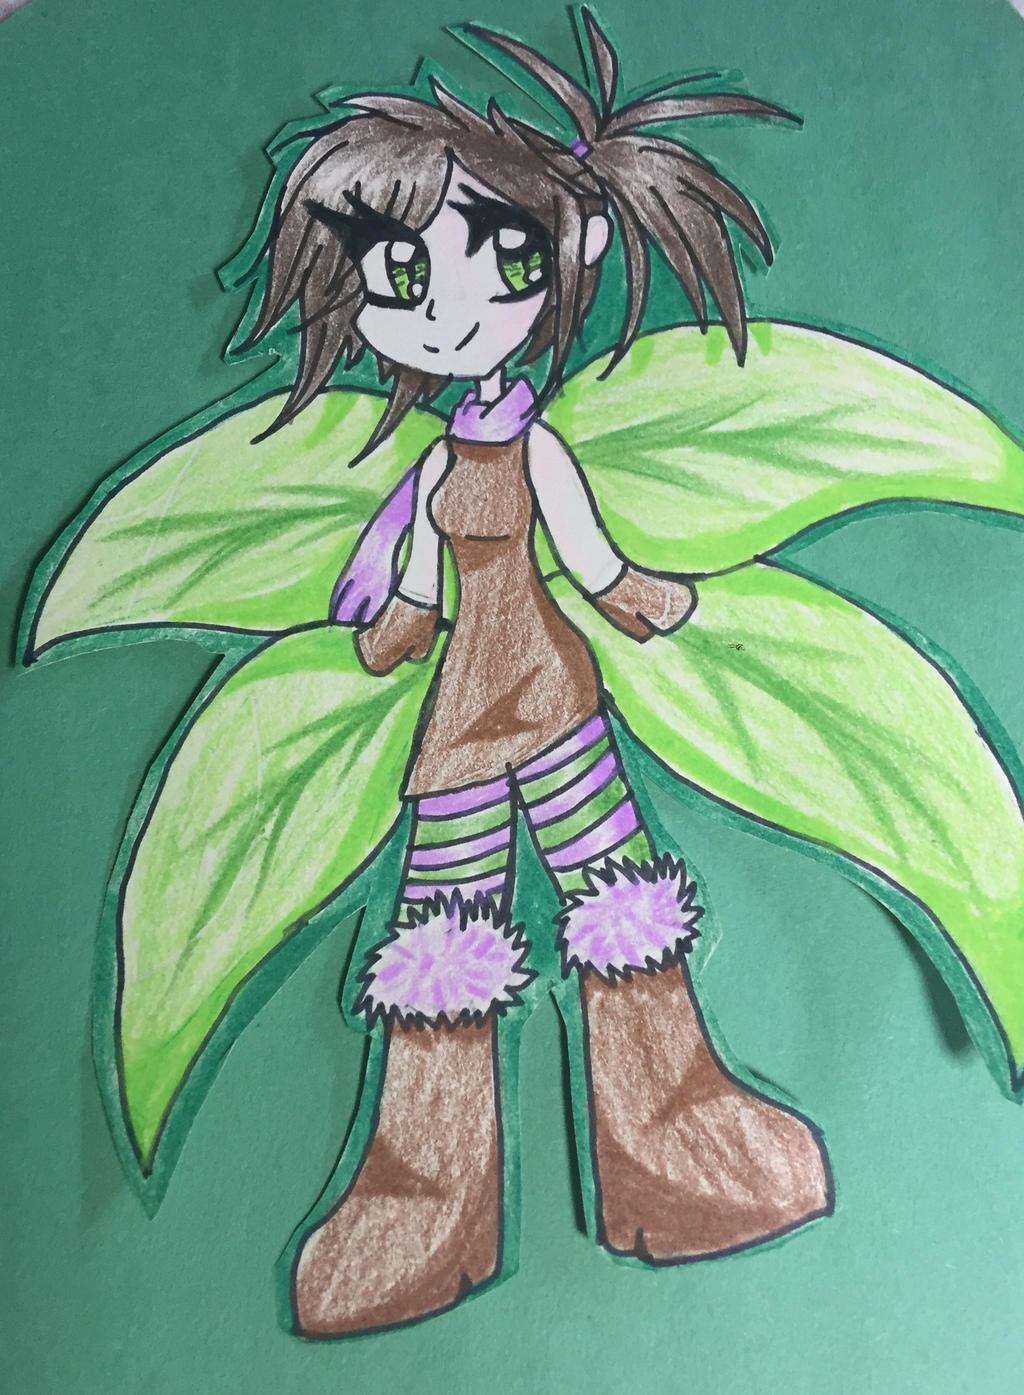 Manga fairy by GoldenFreddyFan1101